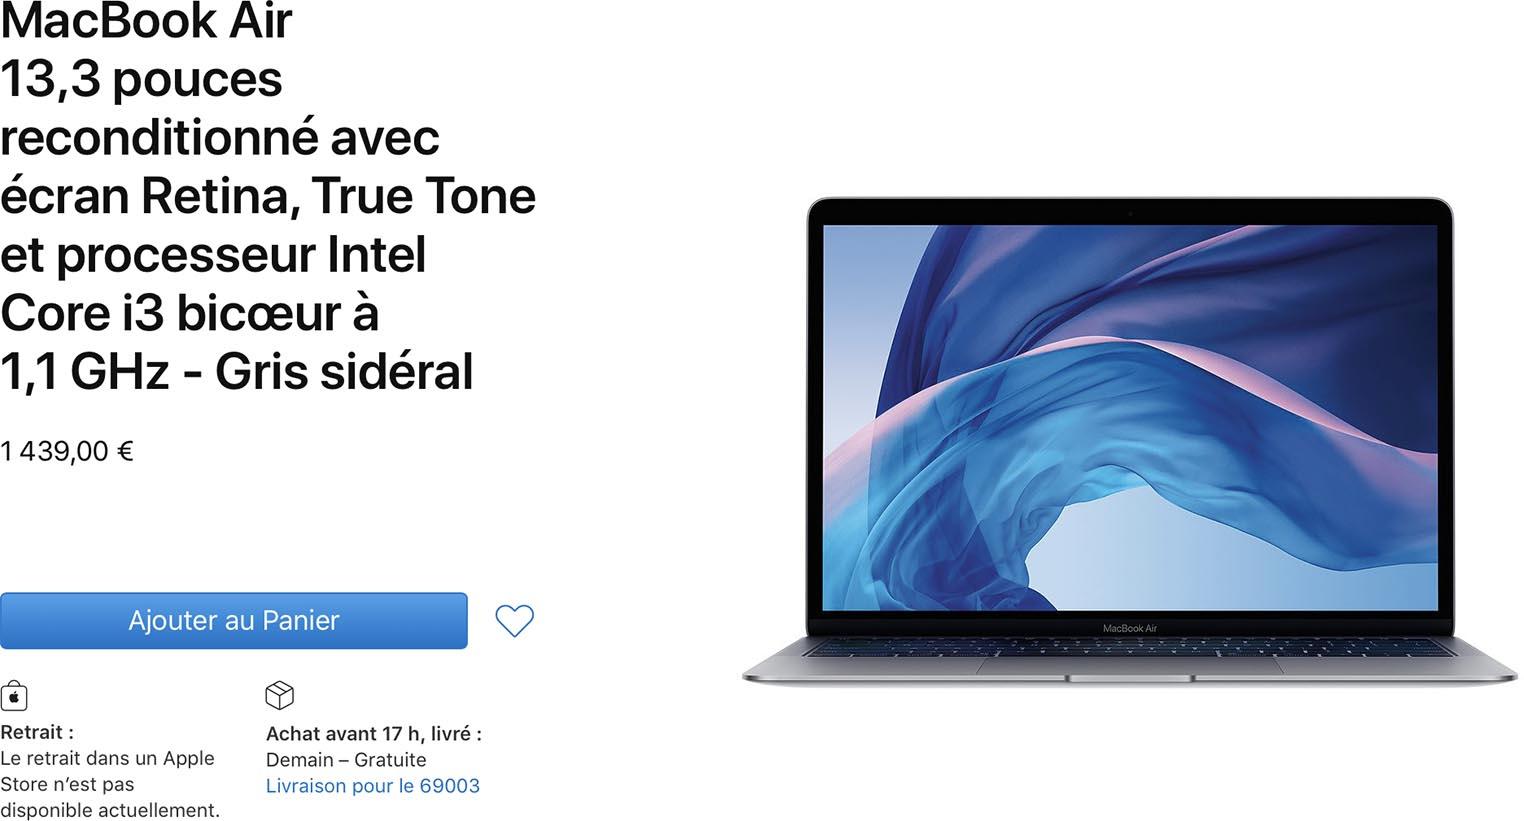 MacBook Air 2020 Refurb Store